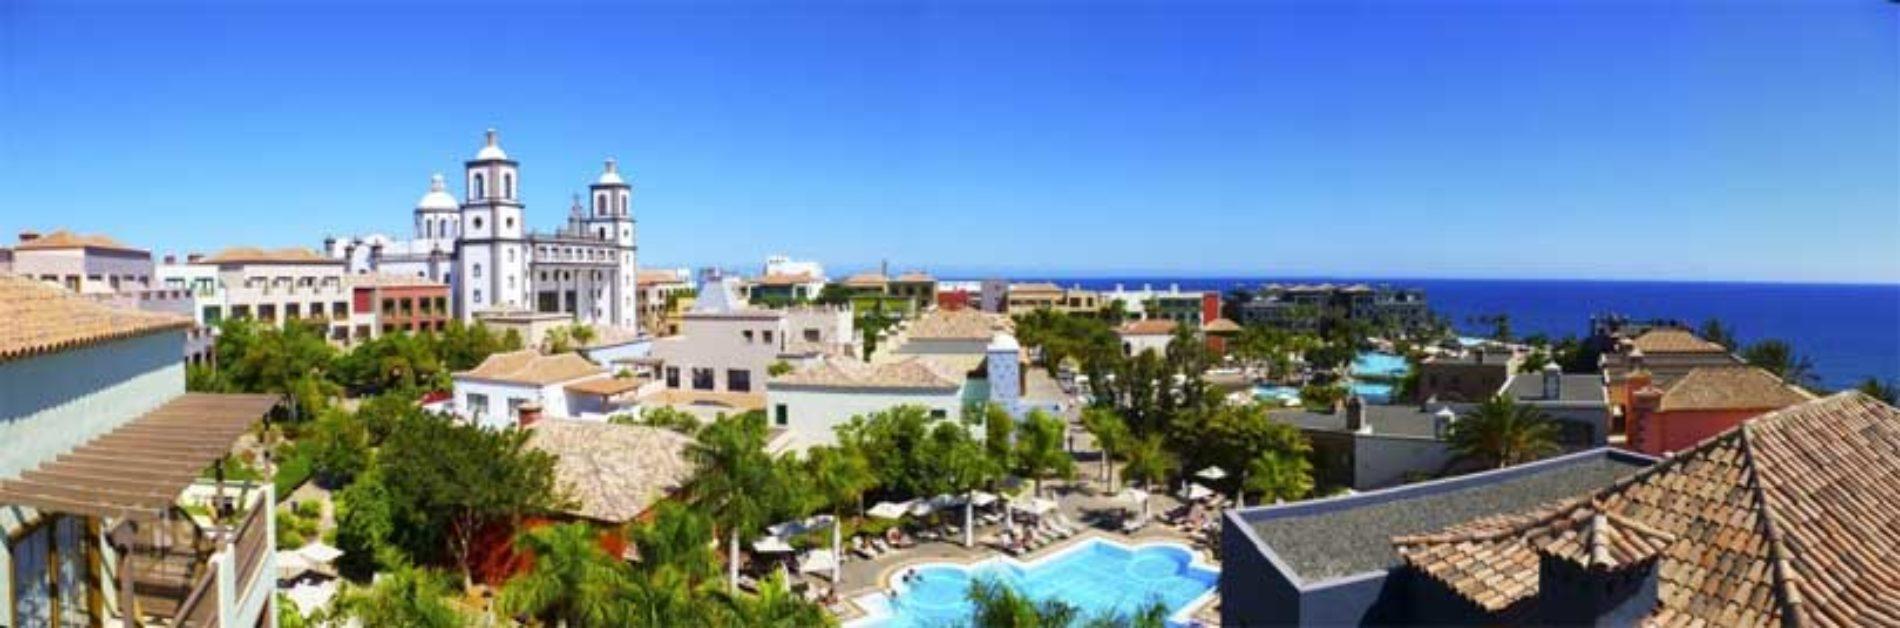 Langtidsleie Gran Canaria